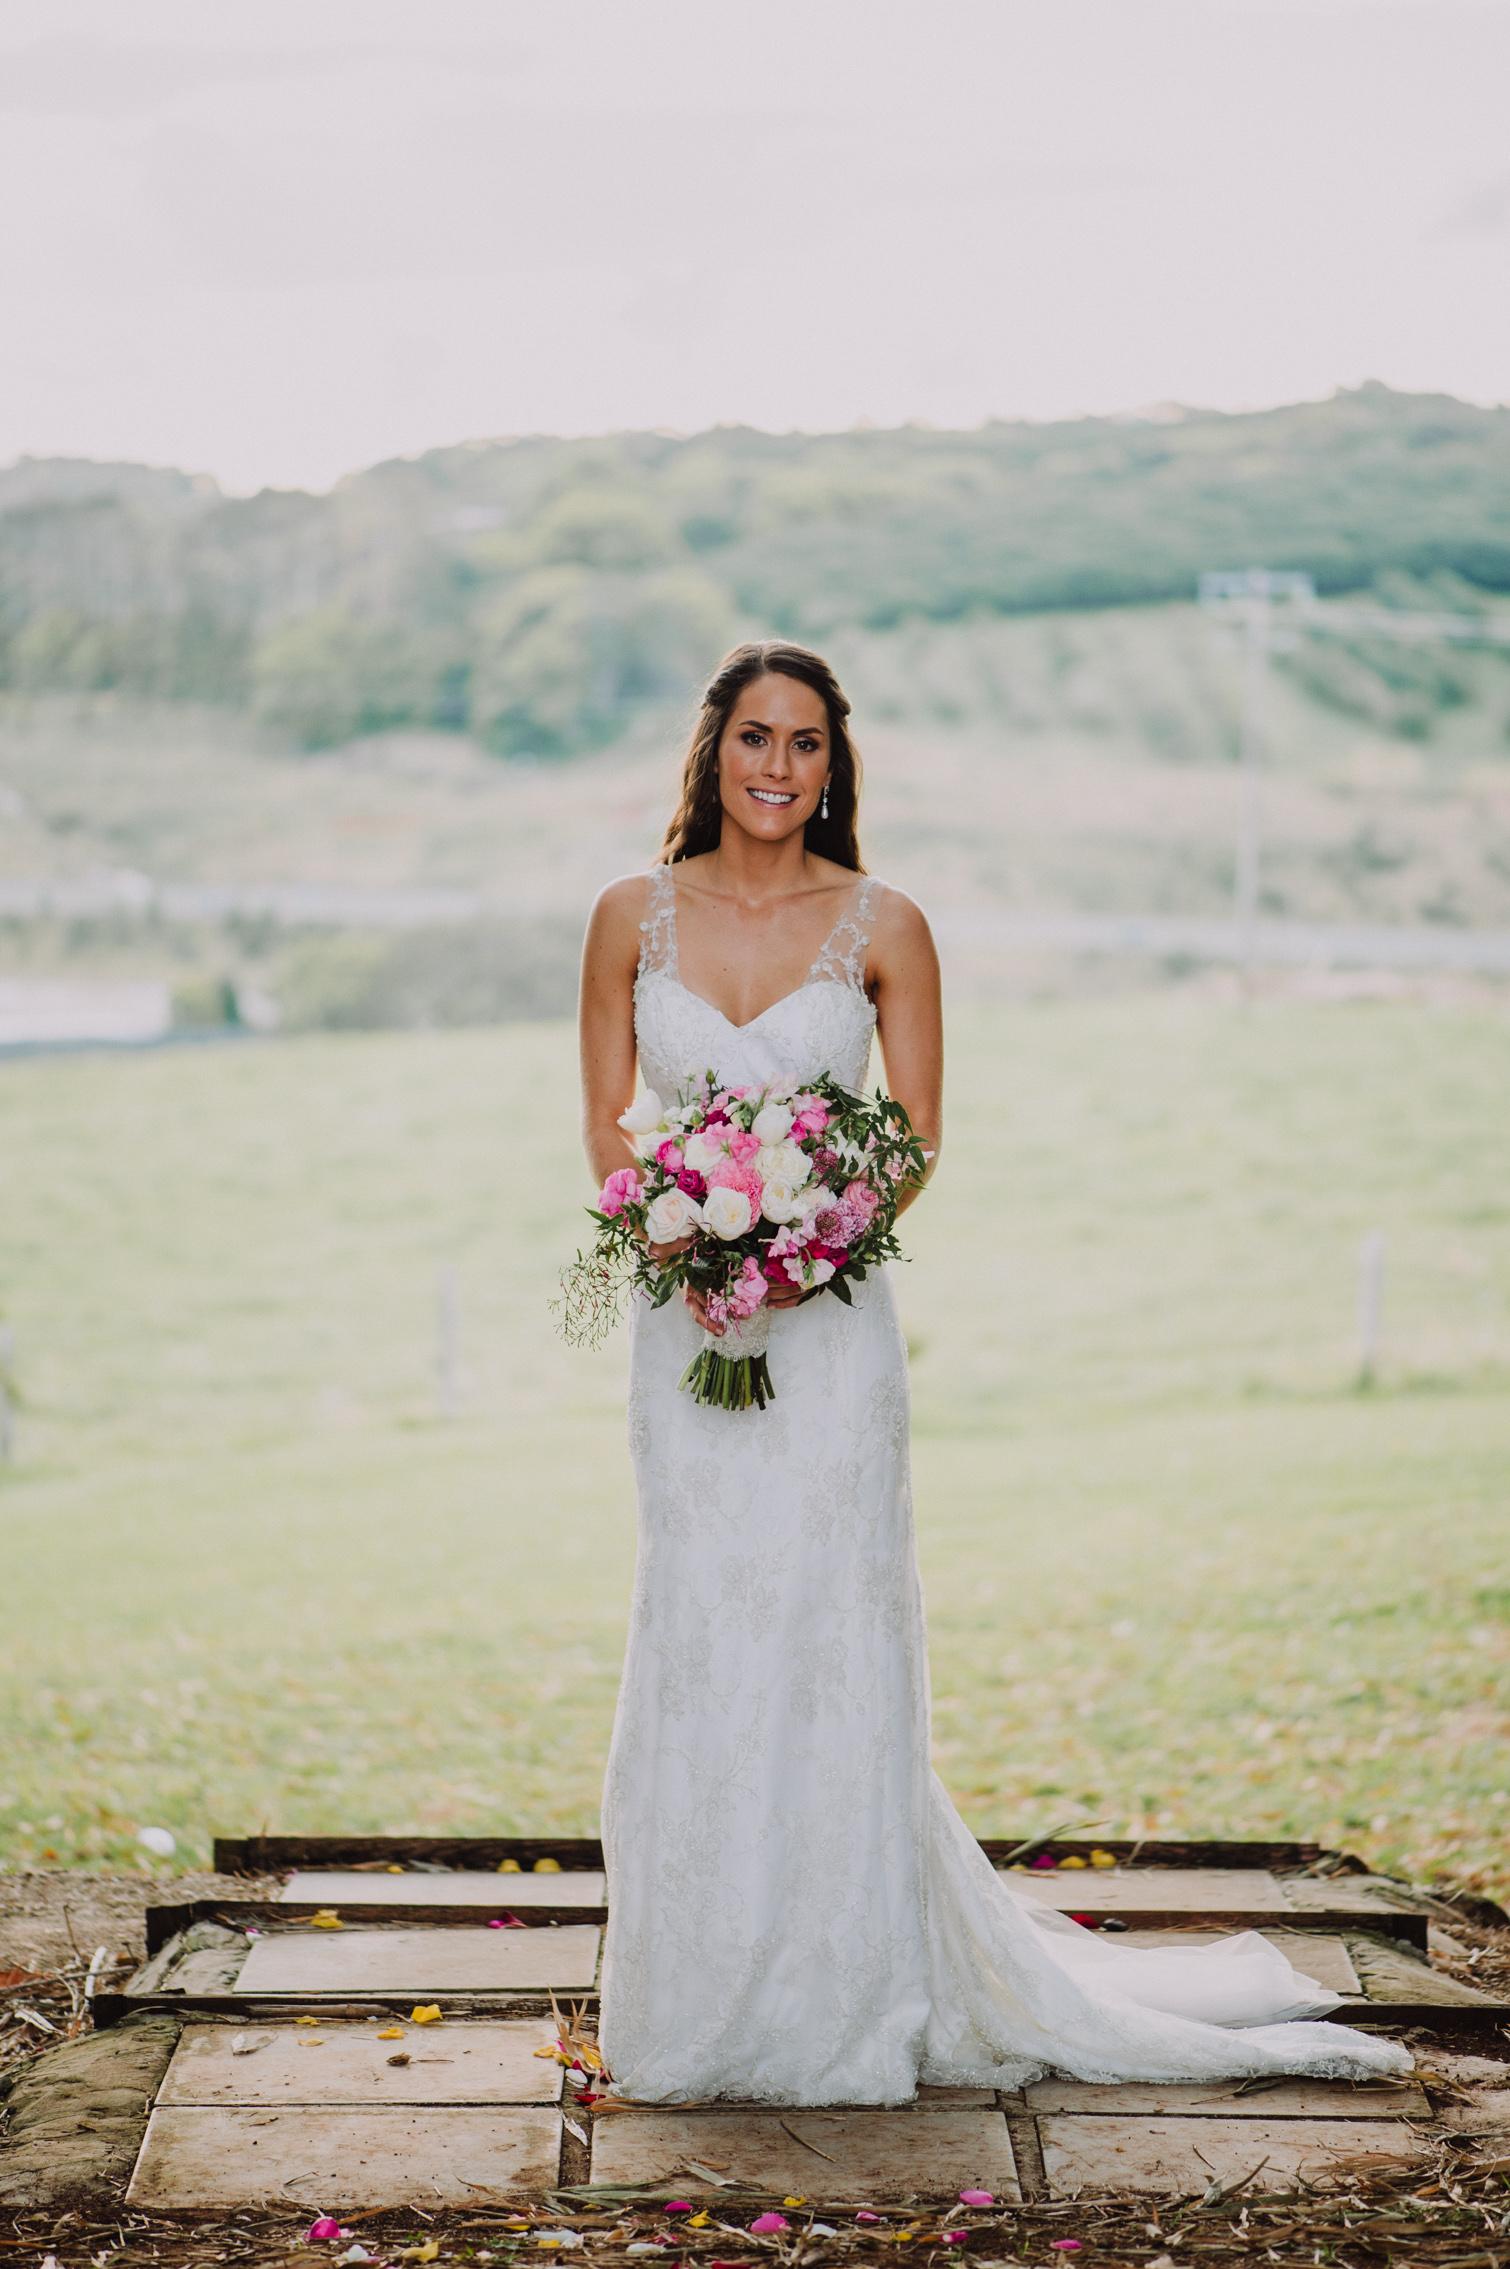 The_French_Petal_Wedding-Florist-15.jpg